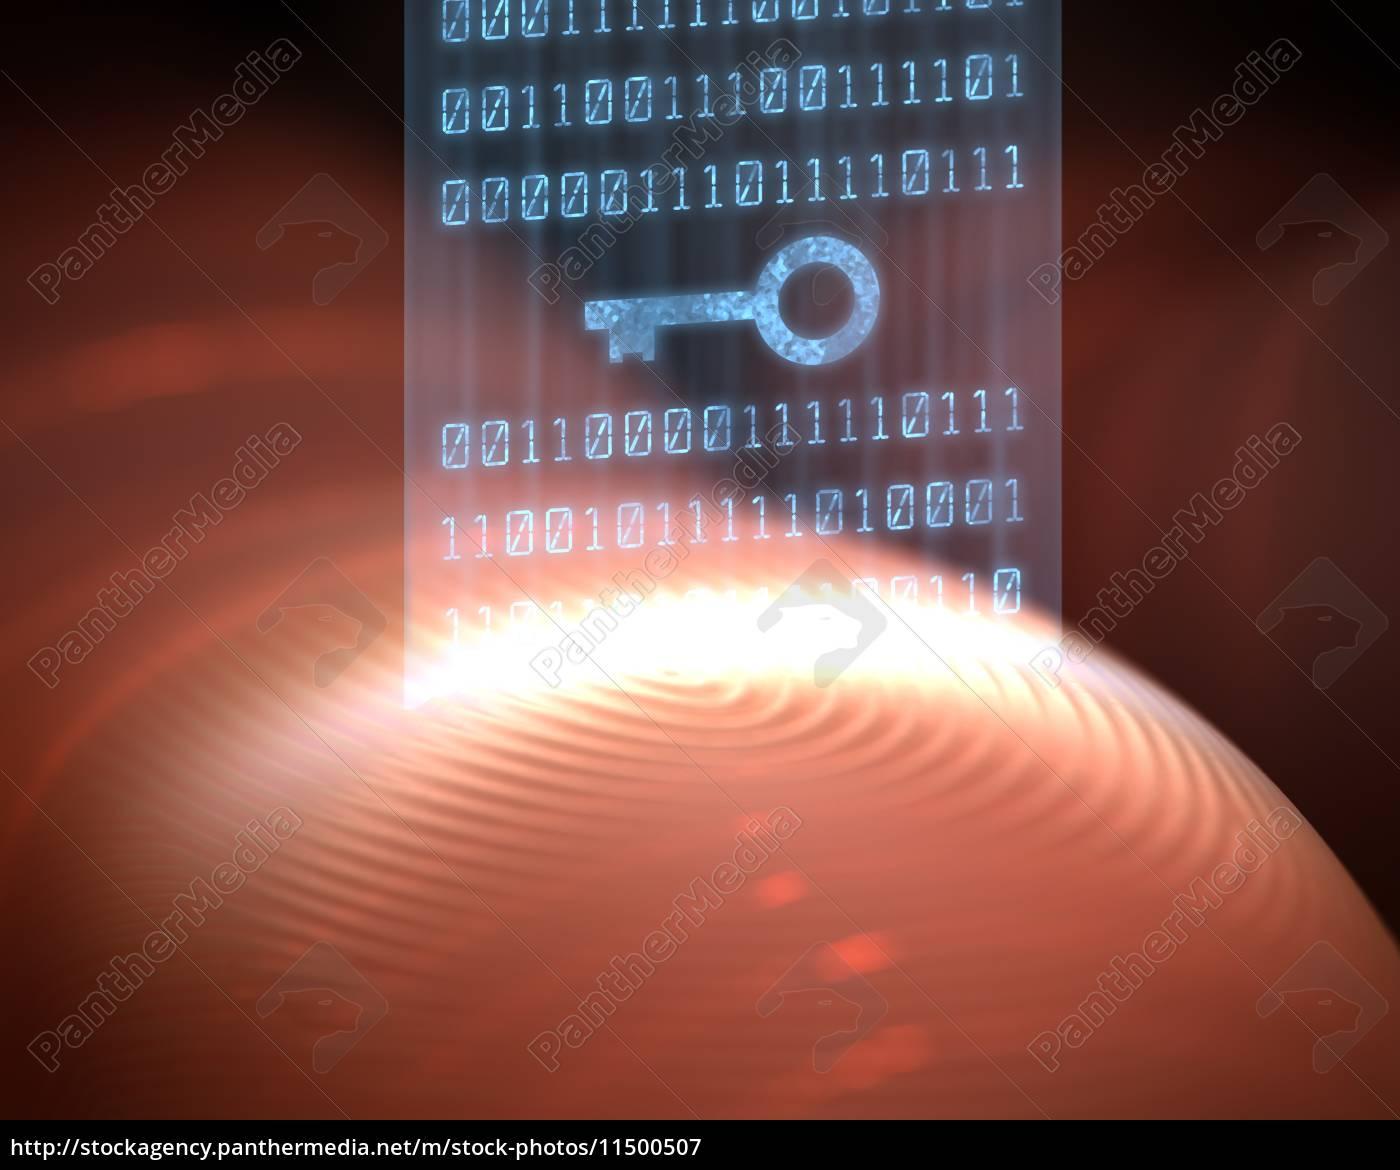 fingerabdruck-sicherheits-digital - 11500507